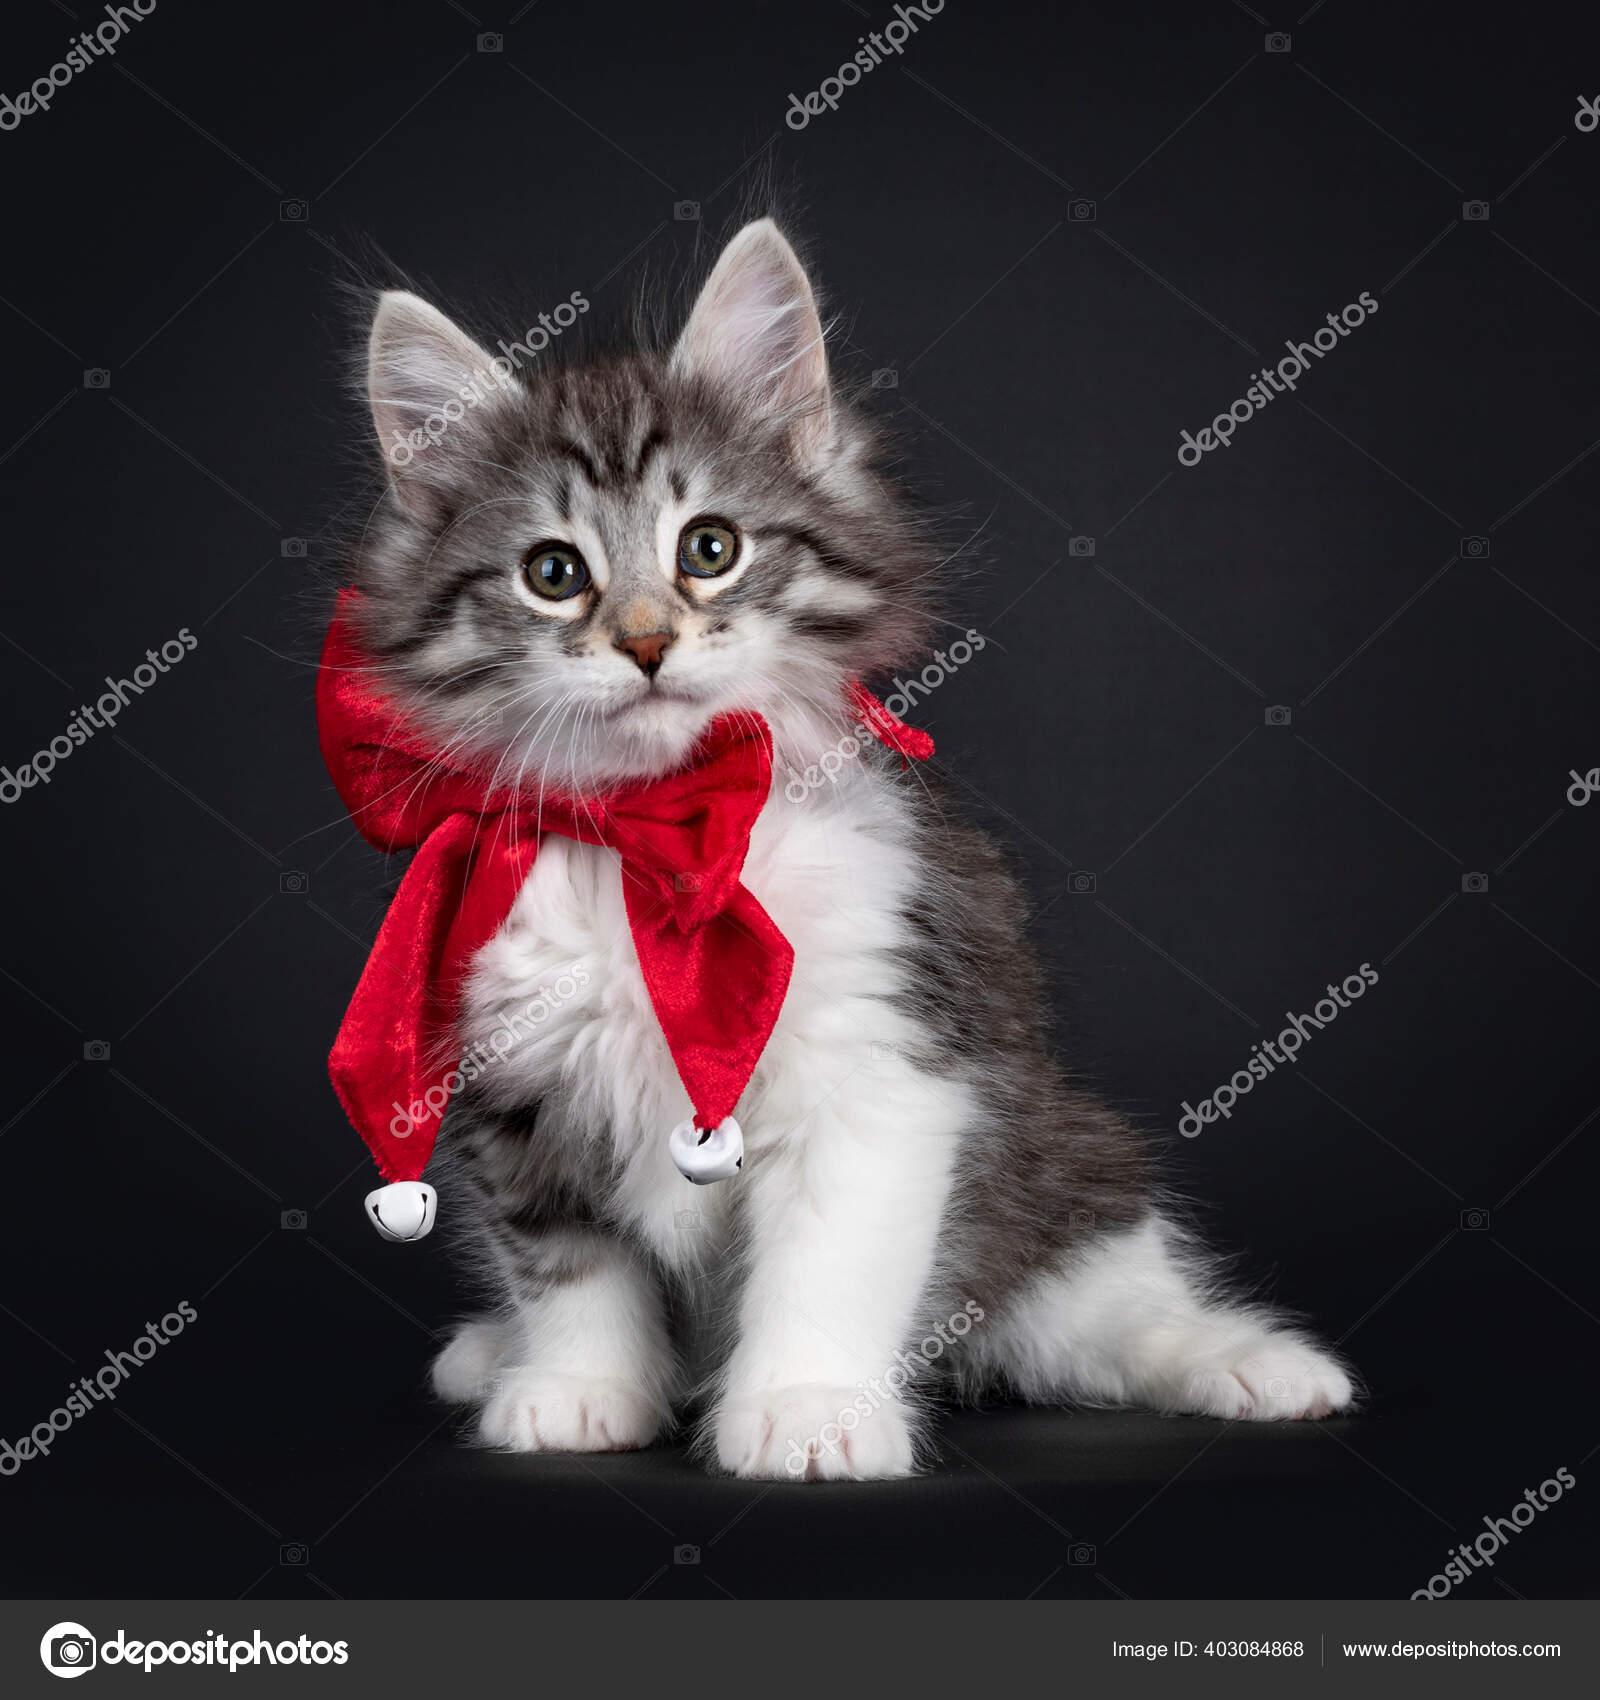 Kucing Hutan Norwegia Kucing Tabby Perak Hitam Menggemaskan Mengenakan Dasi Stok Foto C Nynkevanholten 403084868